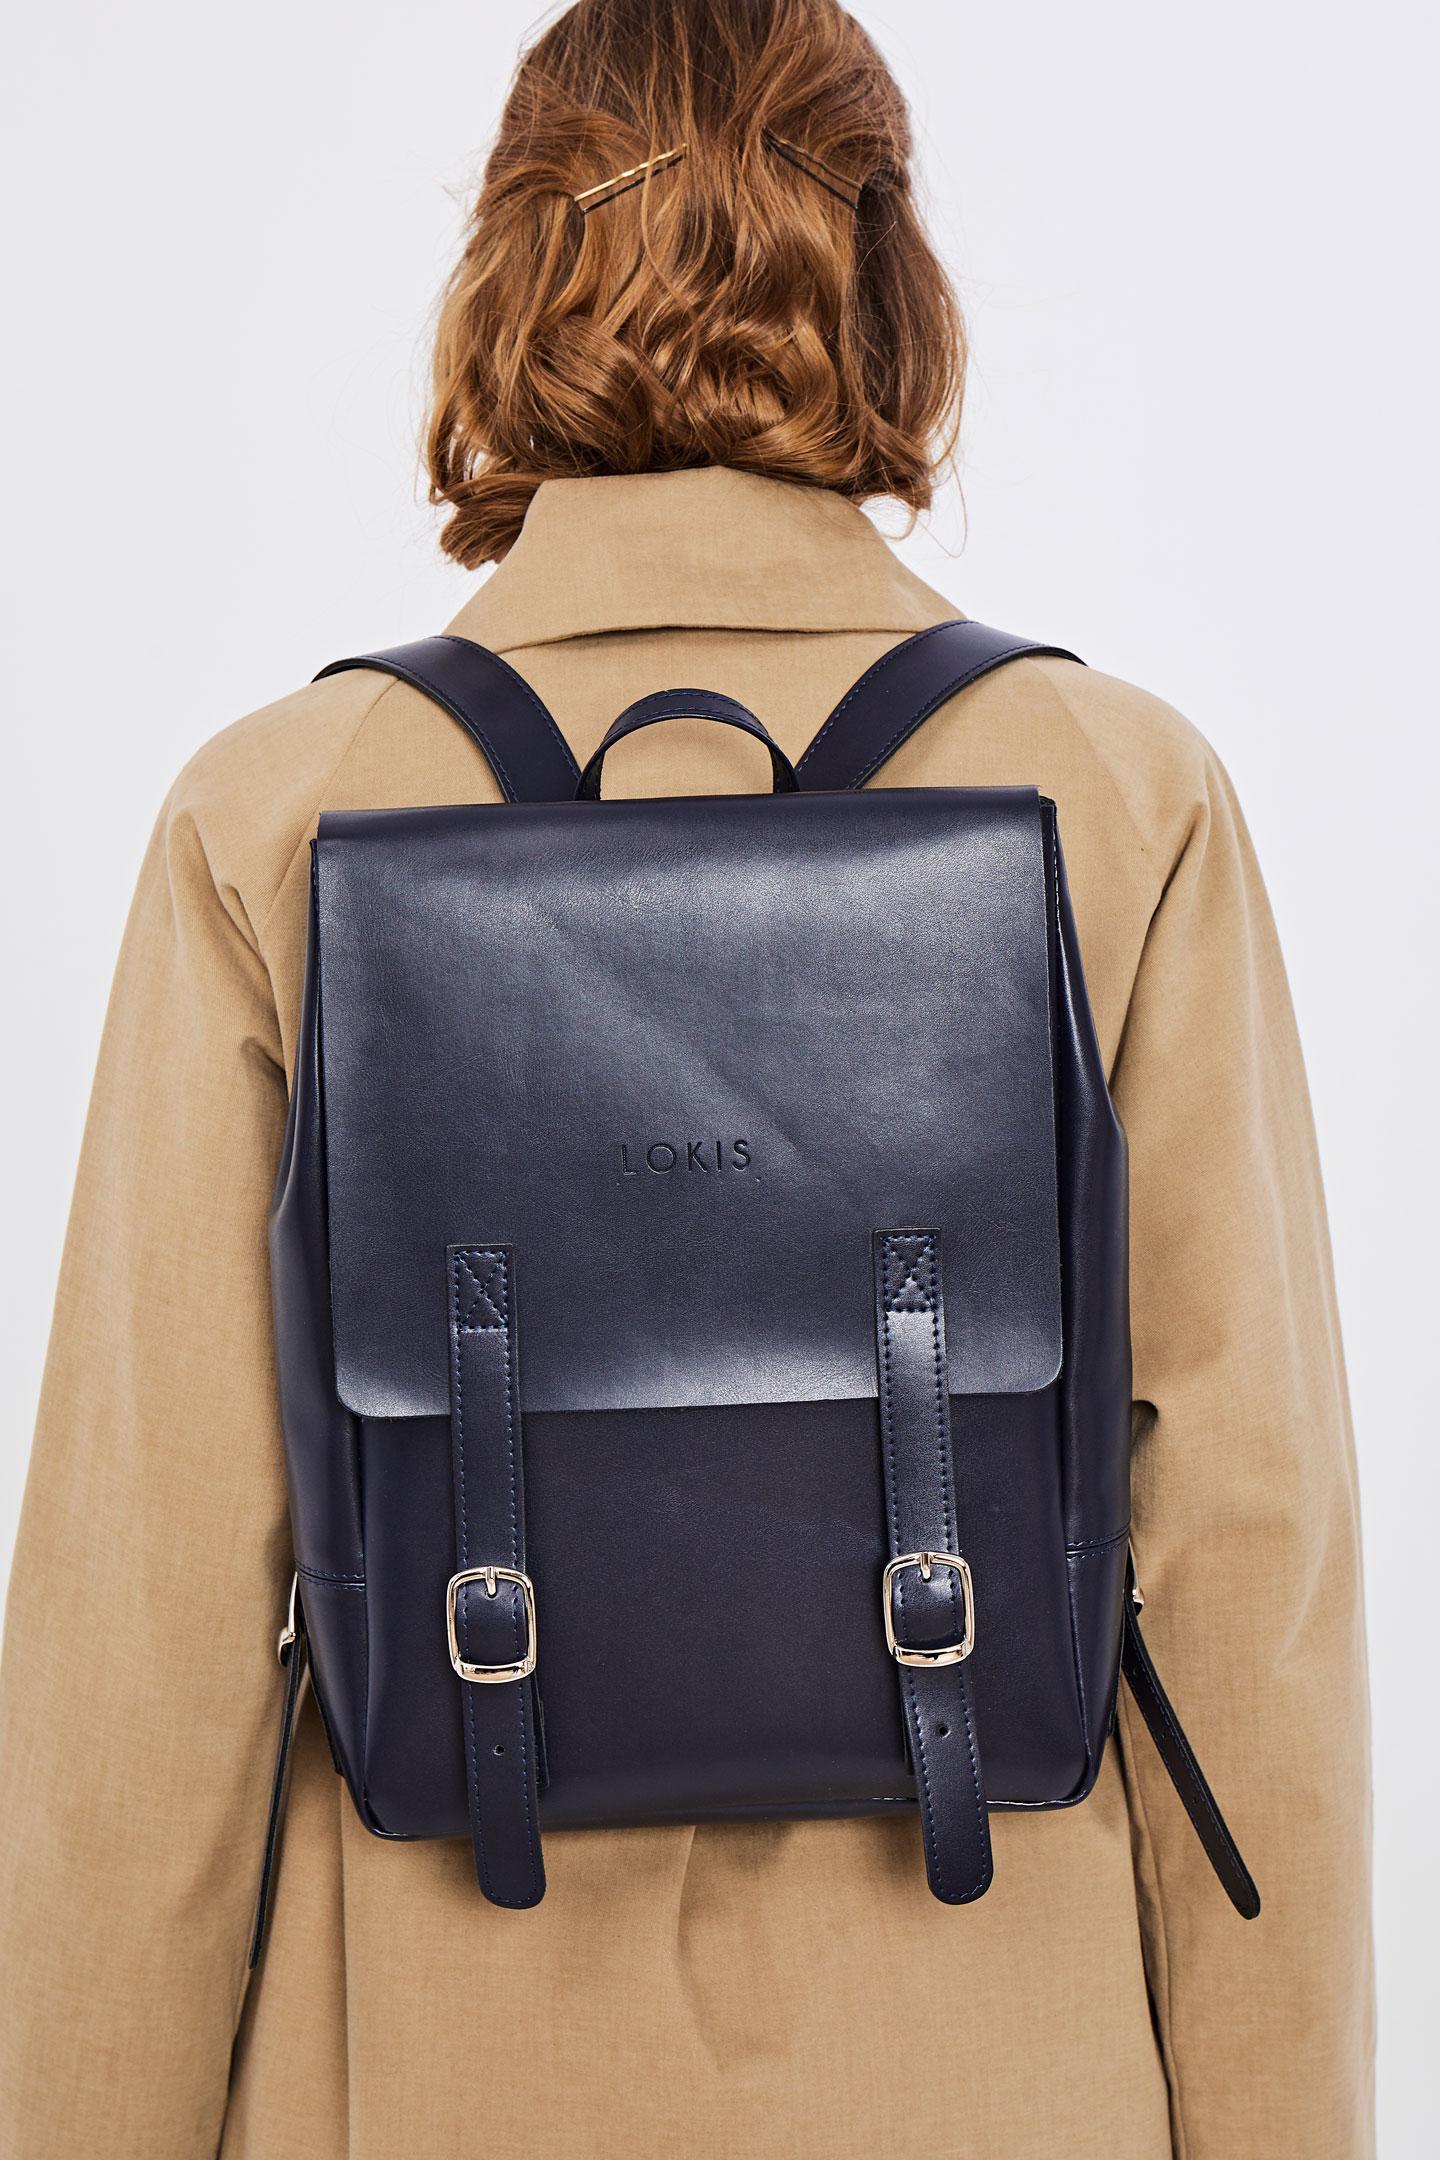 a55efe6d4193 рюкзак Lokis за 6990 рублей в интернет магазине Click-Boutique